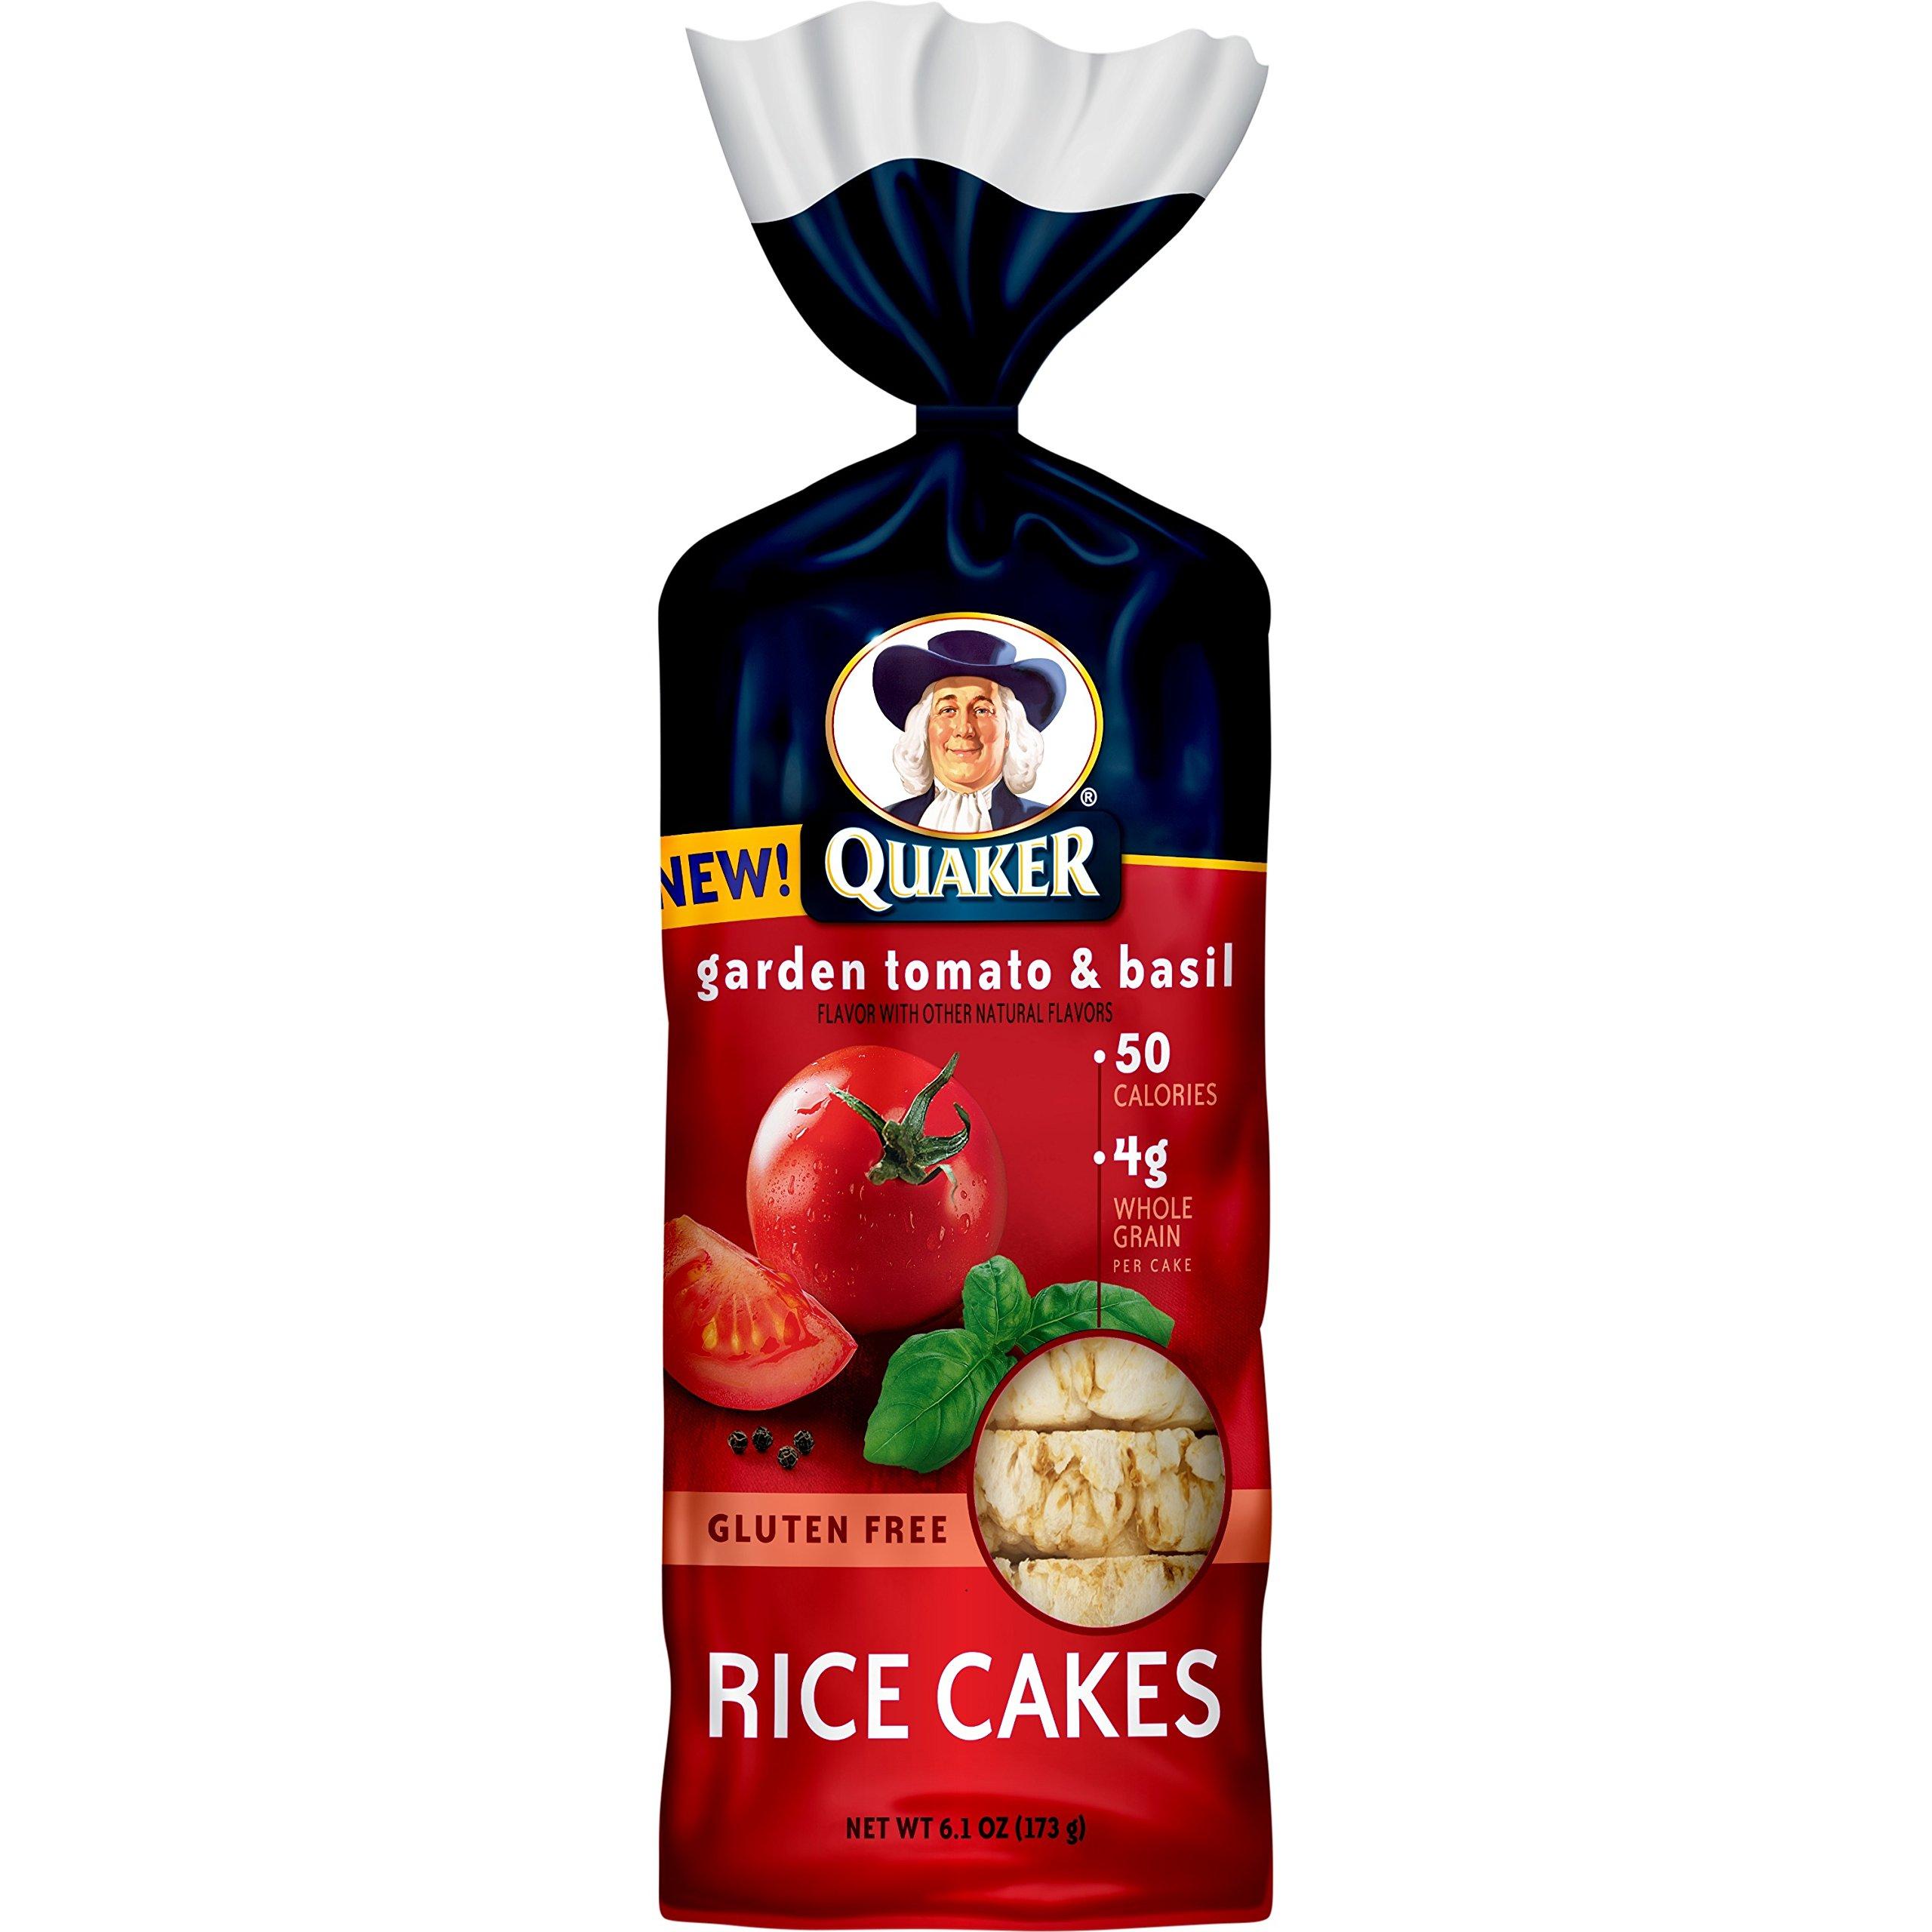 Quaker Rice Cakes, Garden Tomato and Basil, Gluten Free, 6.1oz by Quaker (Image #1)